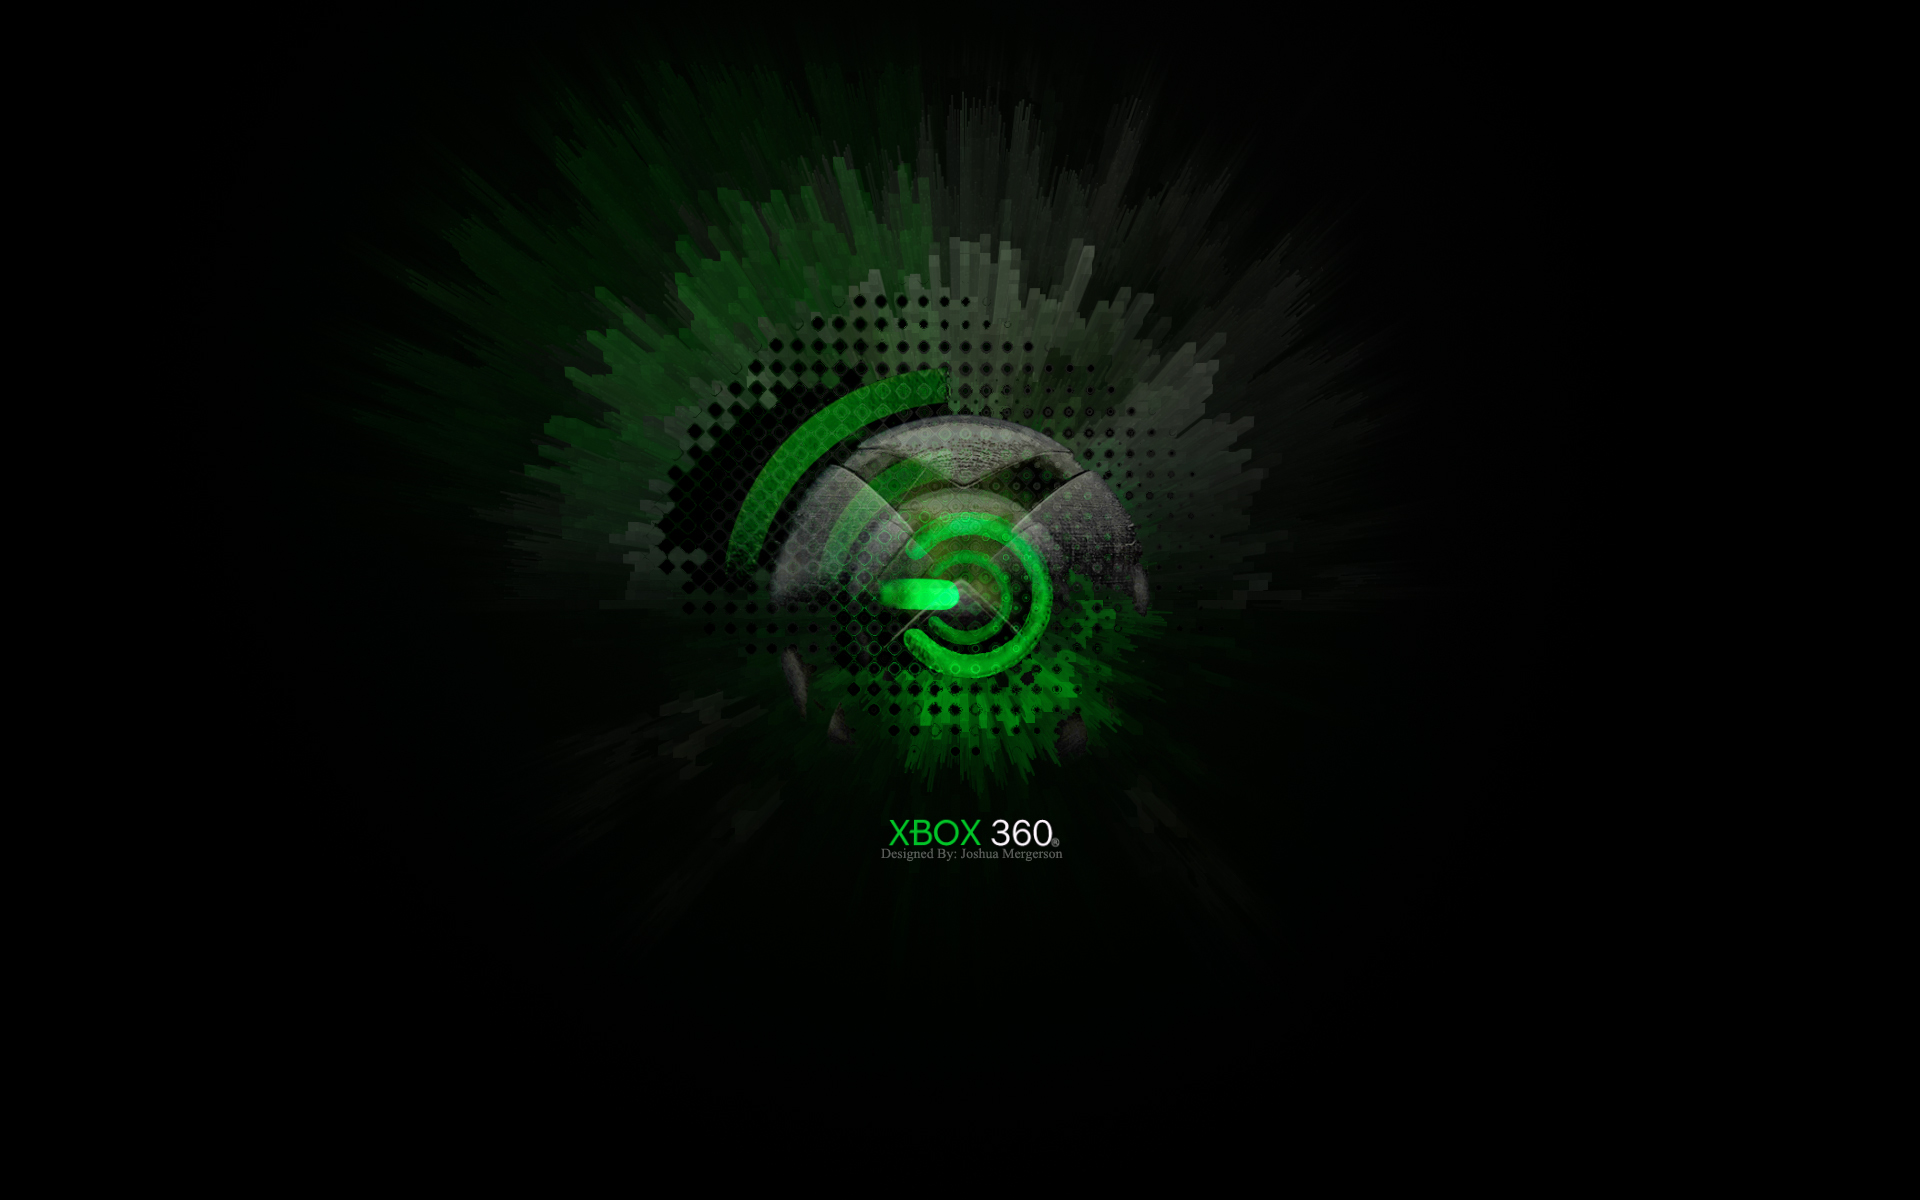 Xbox 360 1920x1200